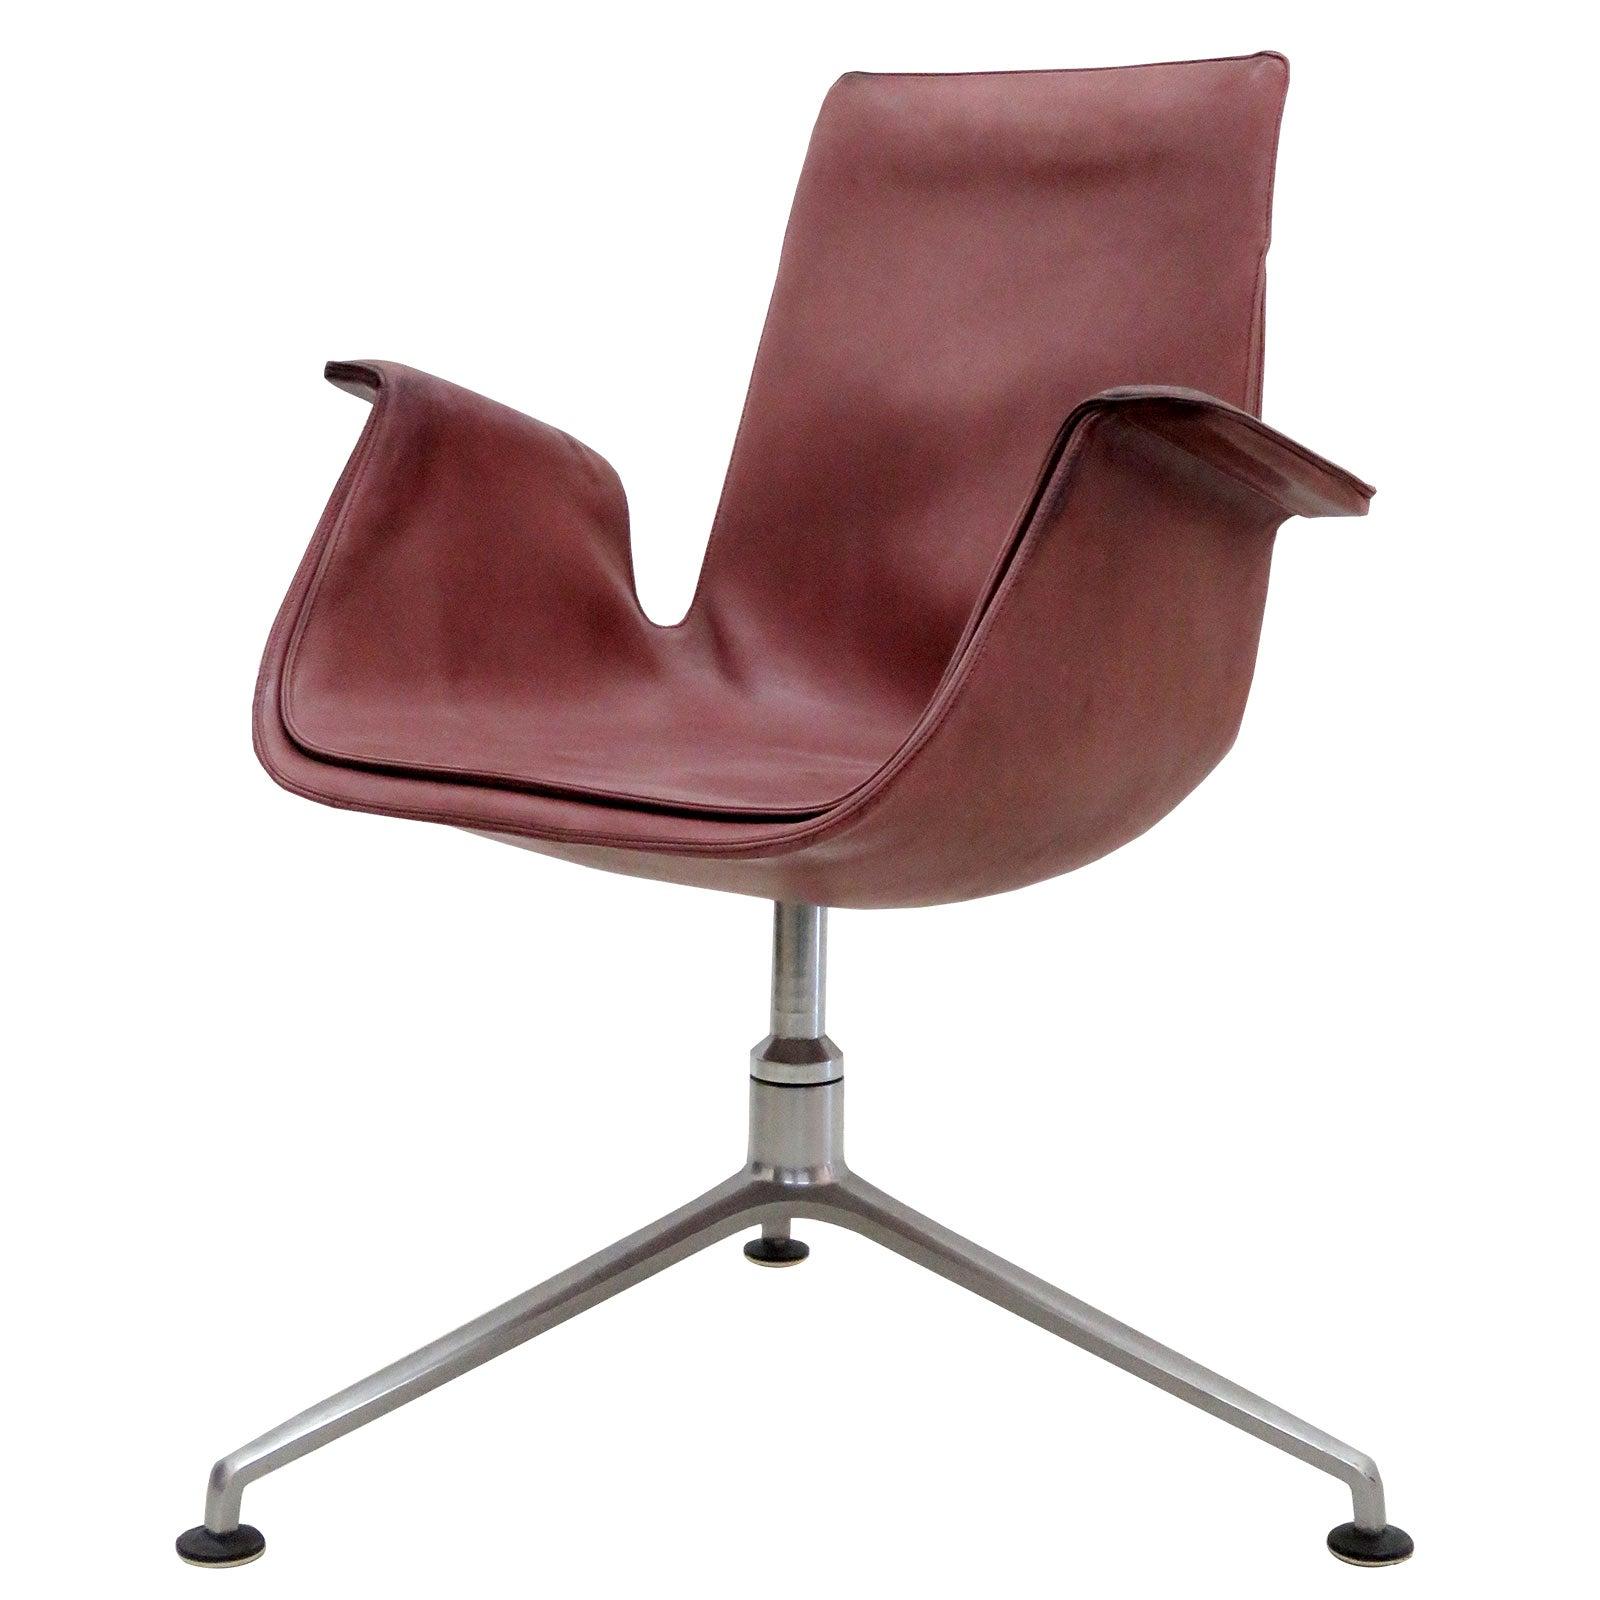 Preben Fabricius 'FK 6727' Chair, 1964